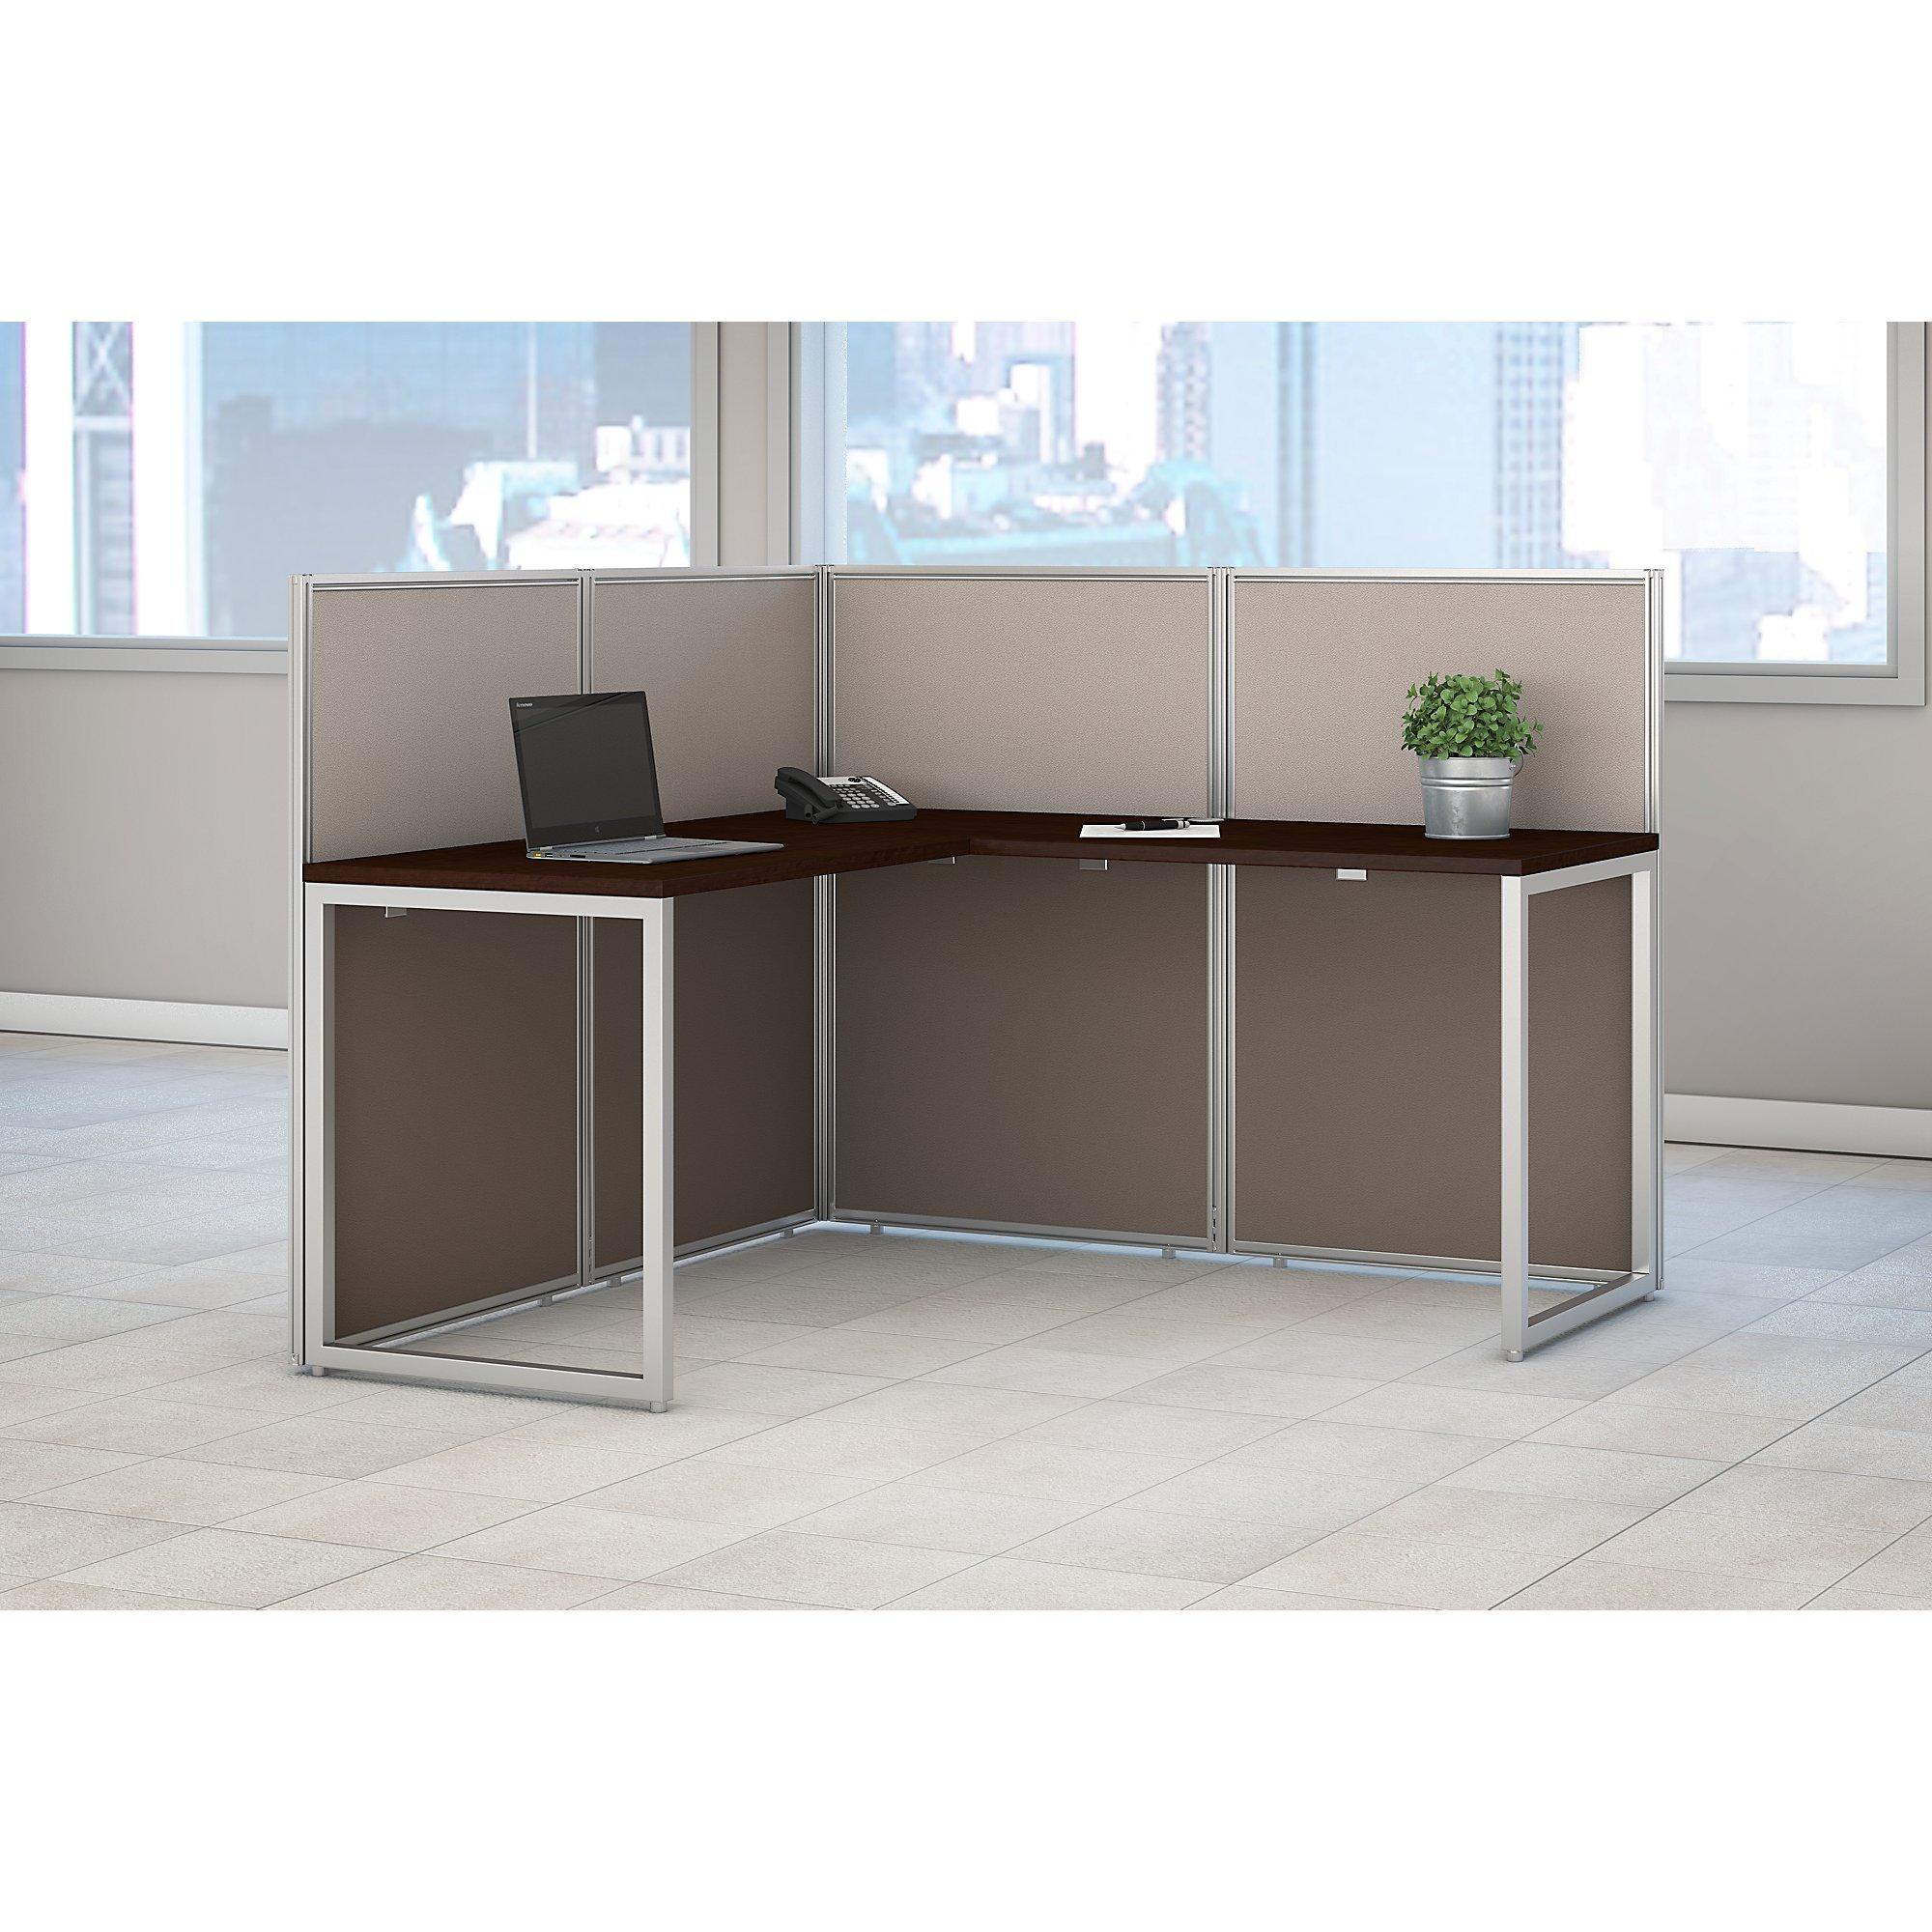 Bush Business Furniture Easy Office 60W L Shaped Desk Open Office in Mocha Cherry by Bush Business Furniture (Image #2)